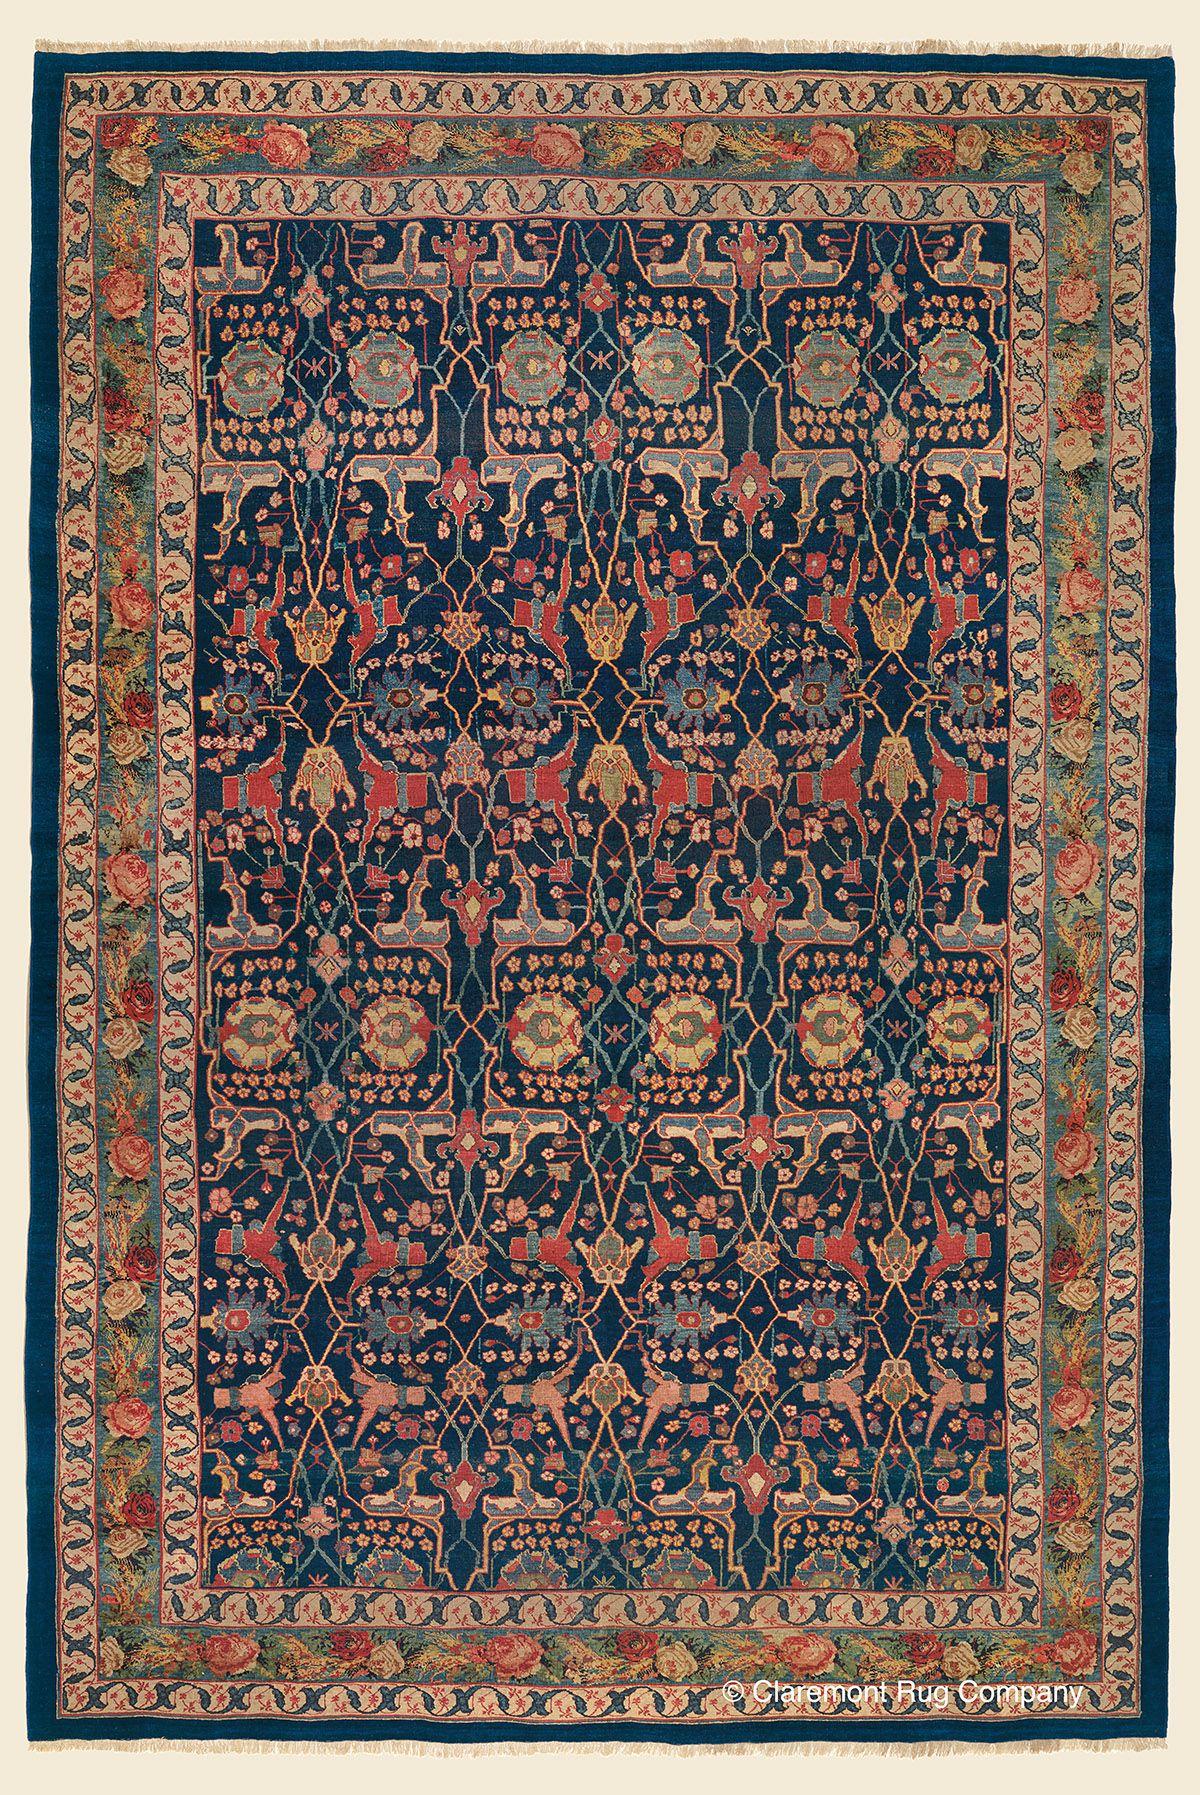 An Antique 9 4 X 14 0 3rd Quarter 19th Century Northwest Persian Garrus Bijar Rug In 2020 Rugs Asian Rugs Rugs On Carpet